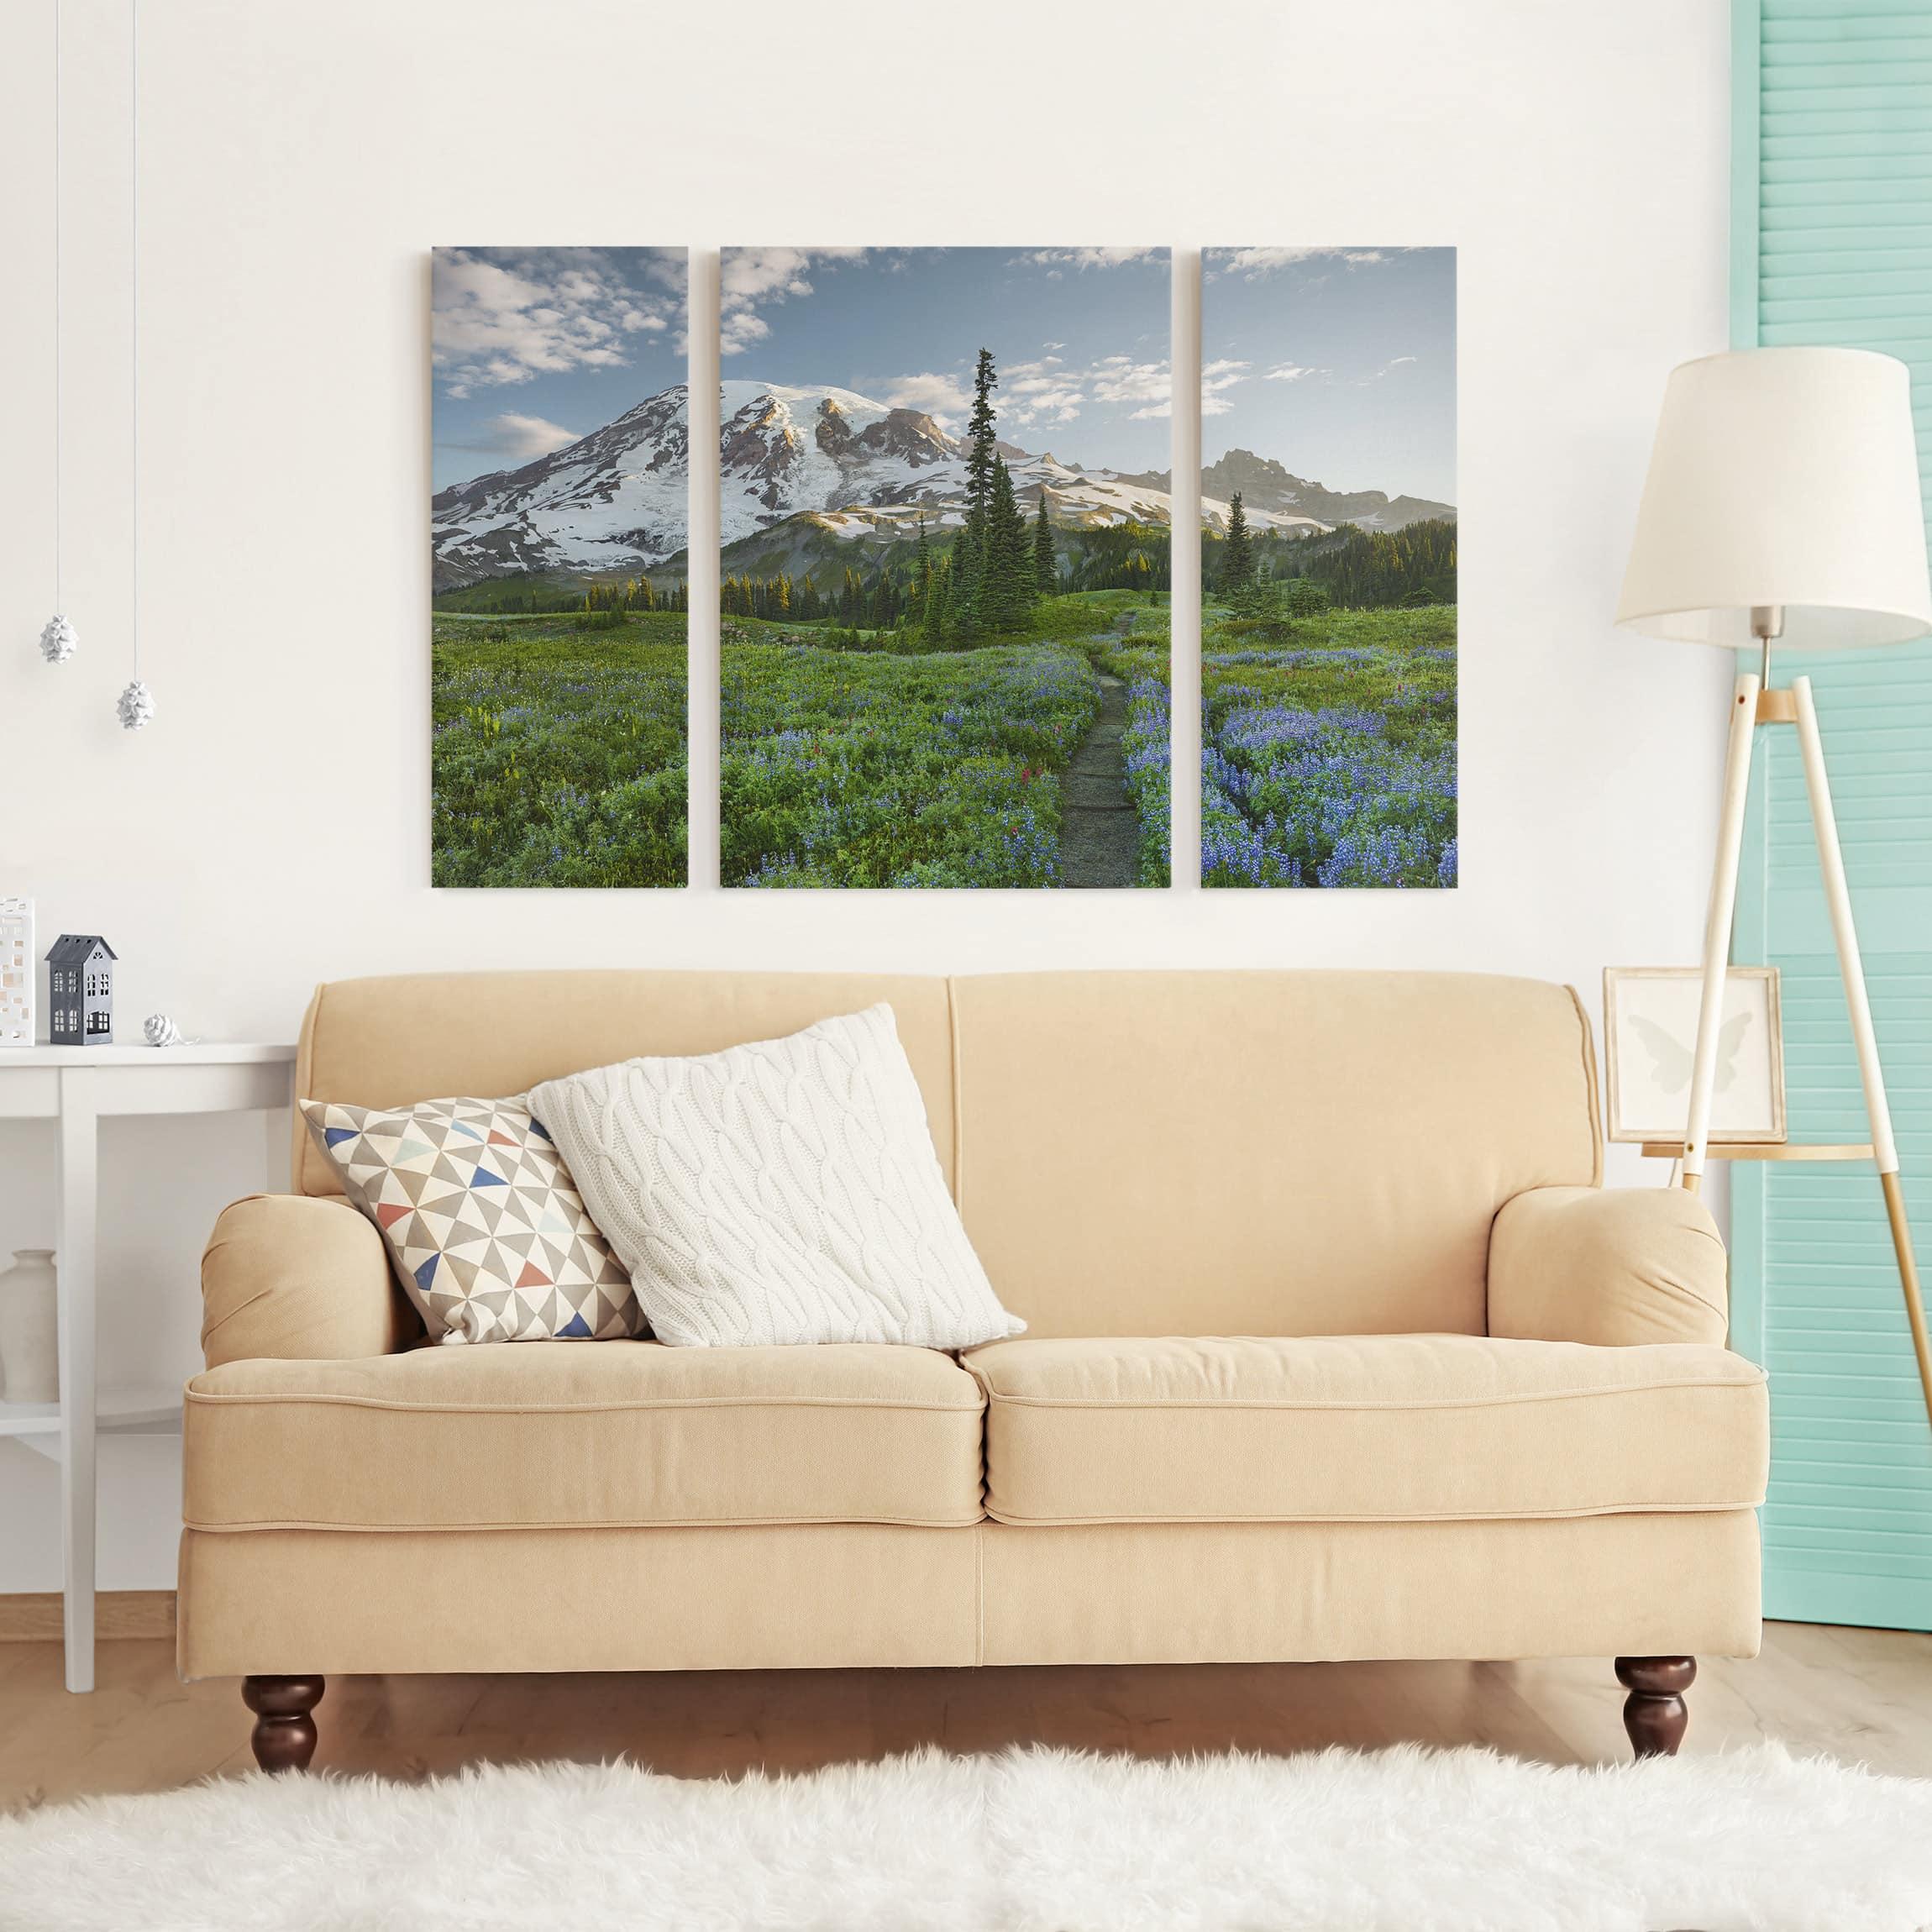 leinwandbild 3 teilig bergblick wiesenpfad triptychon. Black Bedroom Furniture Sets. Home Design Ideas